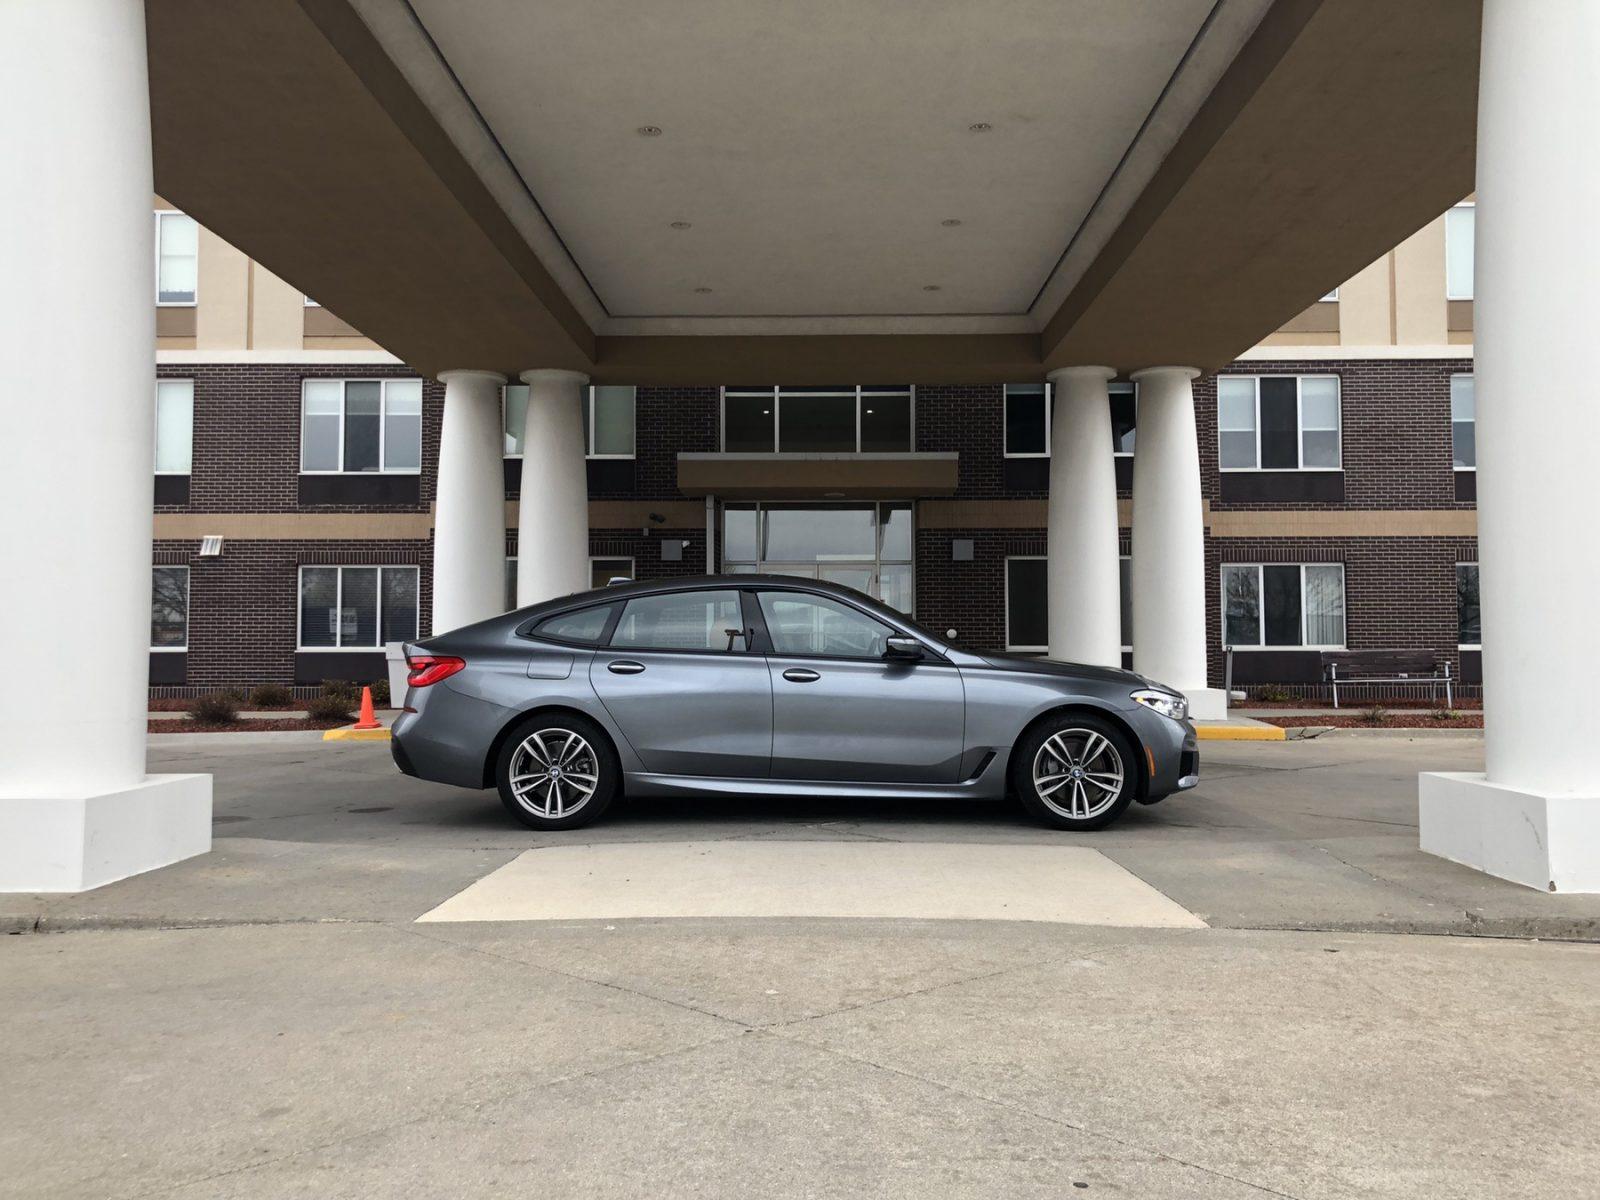 2018 BMW 5 SERIES GT